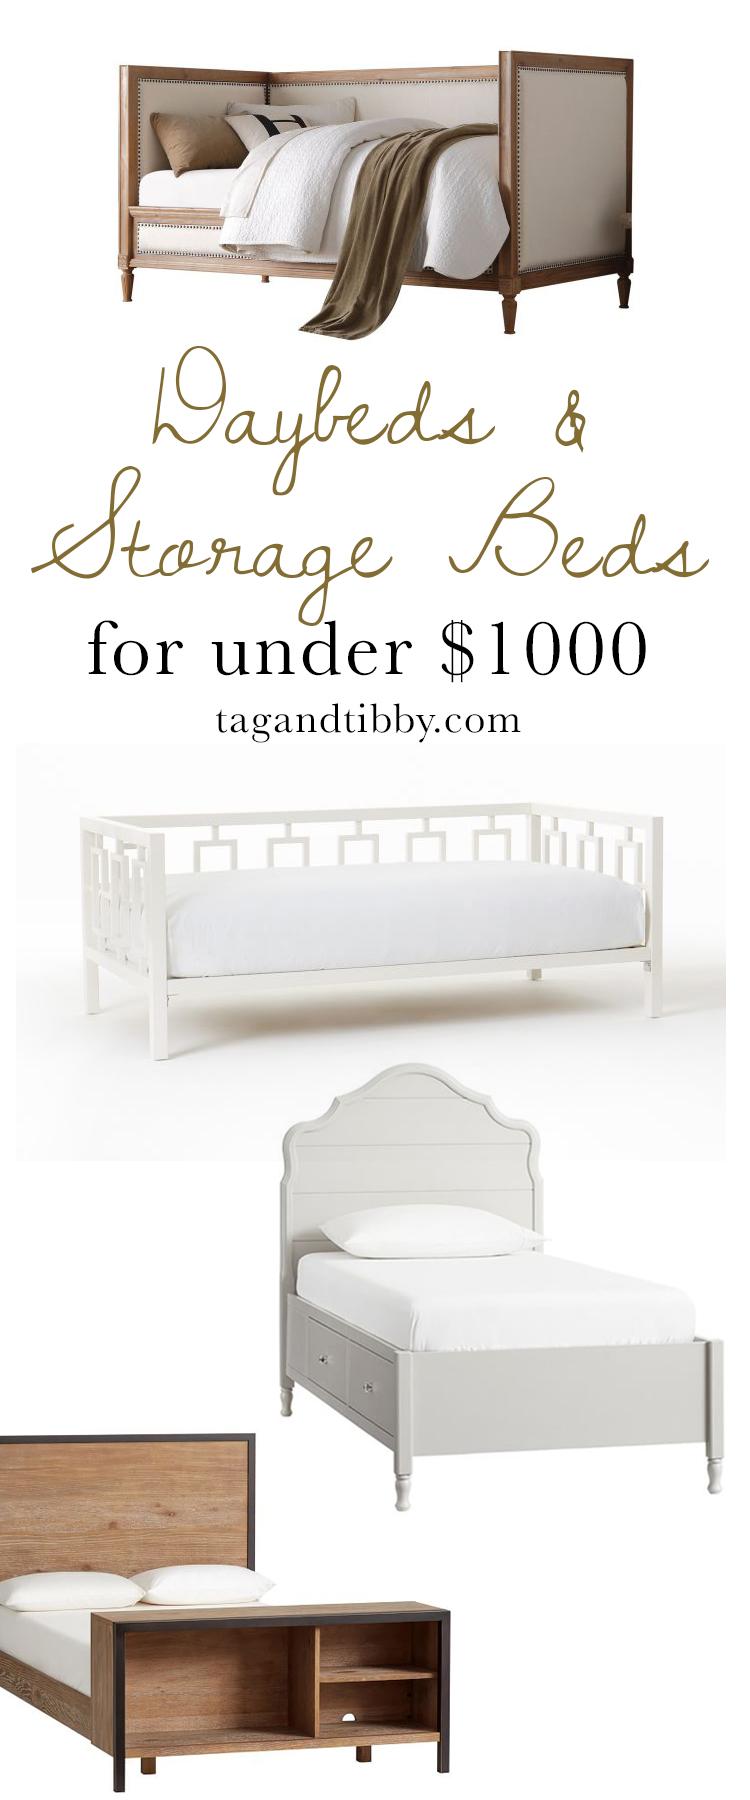 Daybeds & Storage Beds for Tweens priced under $1k